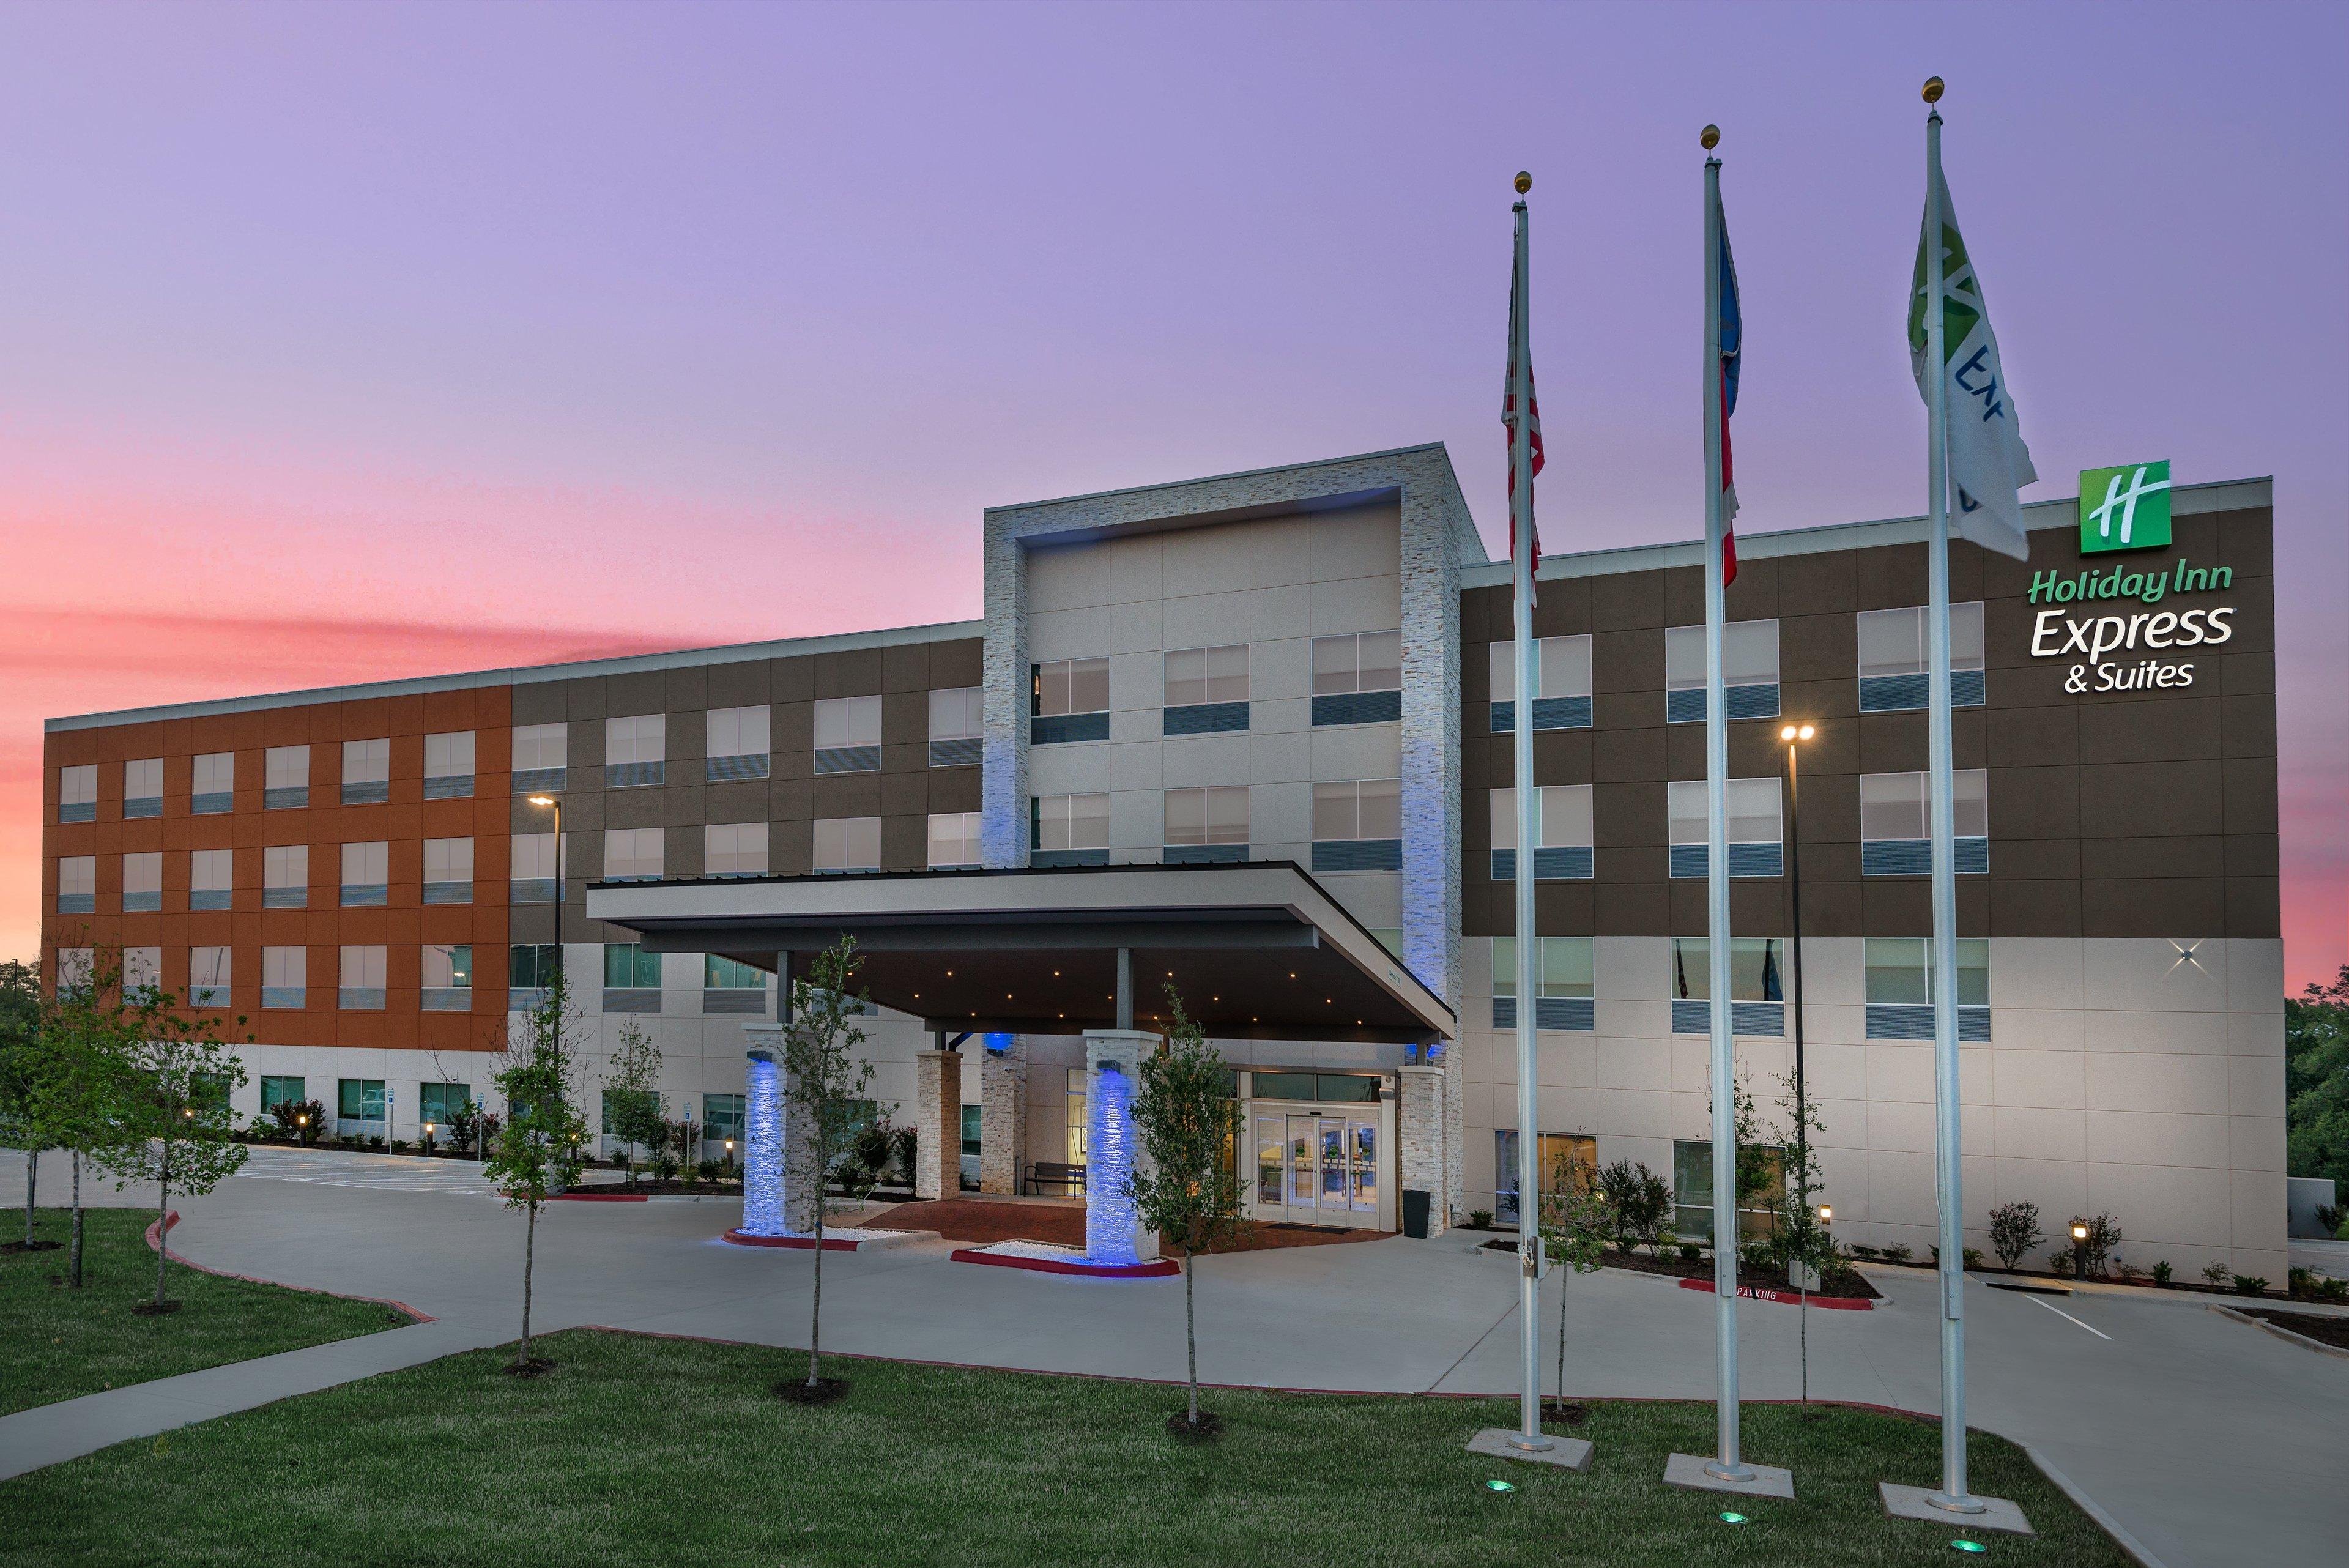 Holiday Inn Express & Suites Bryan